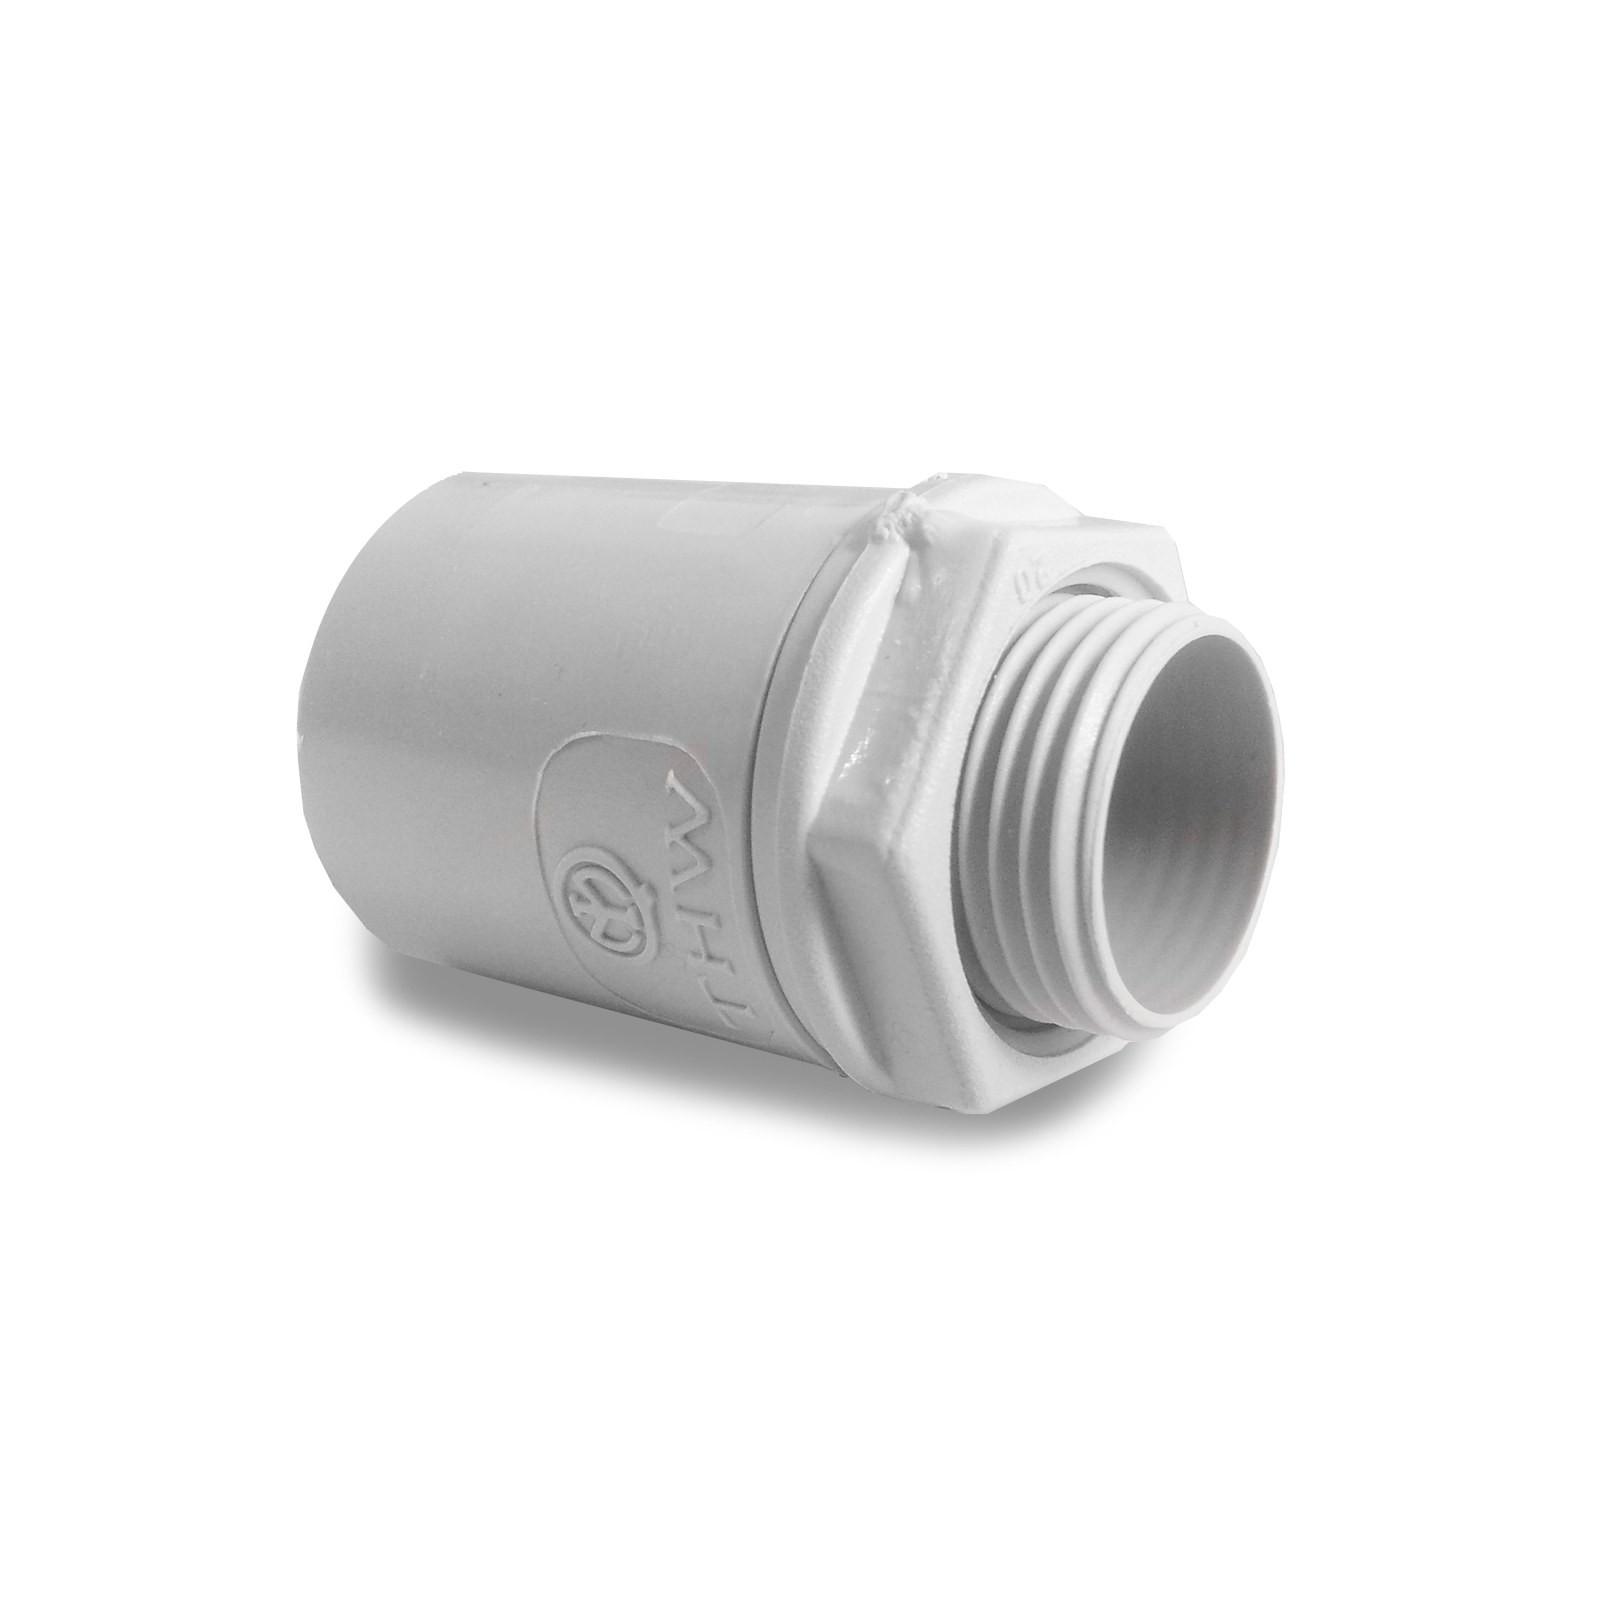 Raccordo tubo rigido scatola in pvc ip67 per impianti - Tubo pvc rigido ...